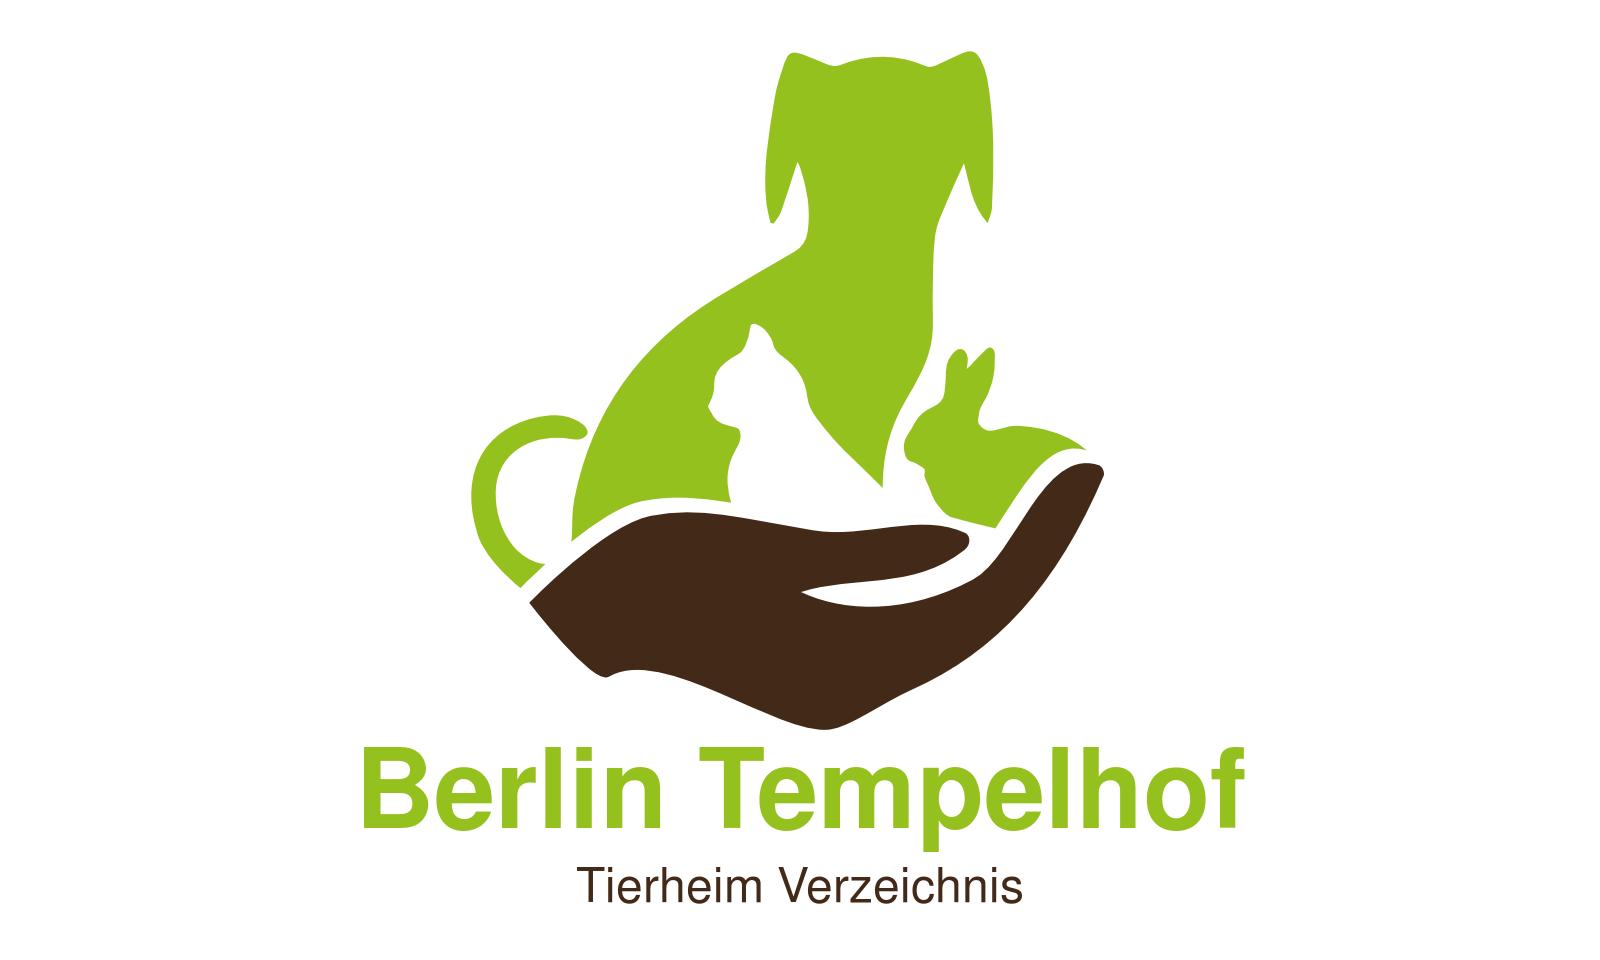 Tierheim Berlin Tempelhof